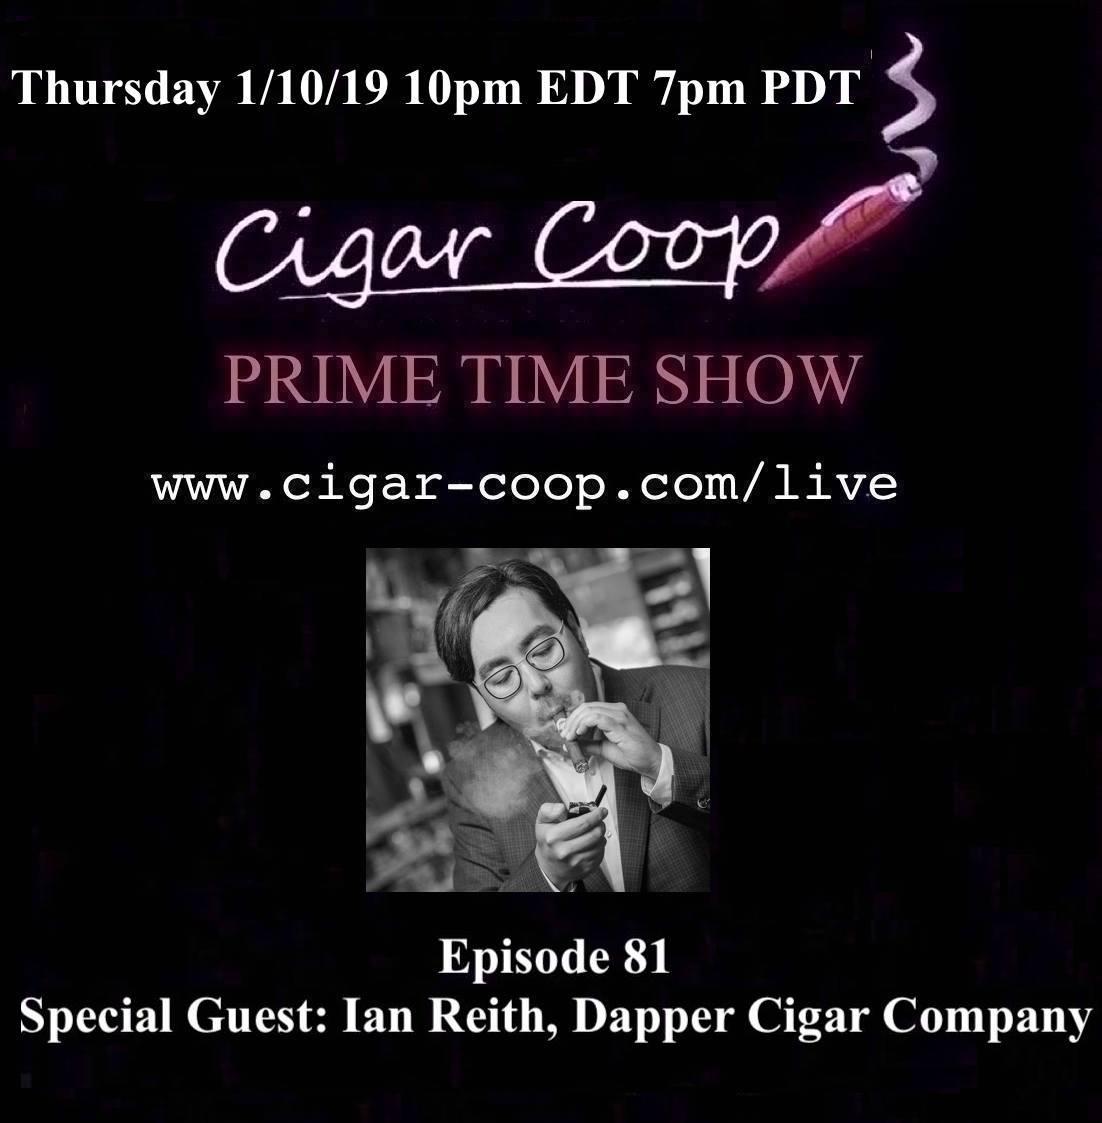 Announcement: Prime Time Episode 81: Ian Reith, Dapper Cigar Company